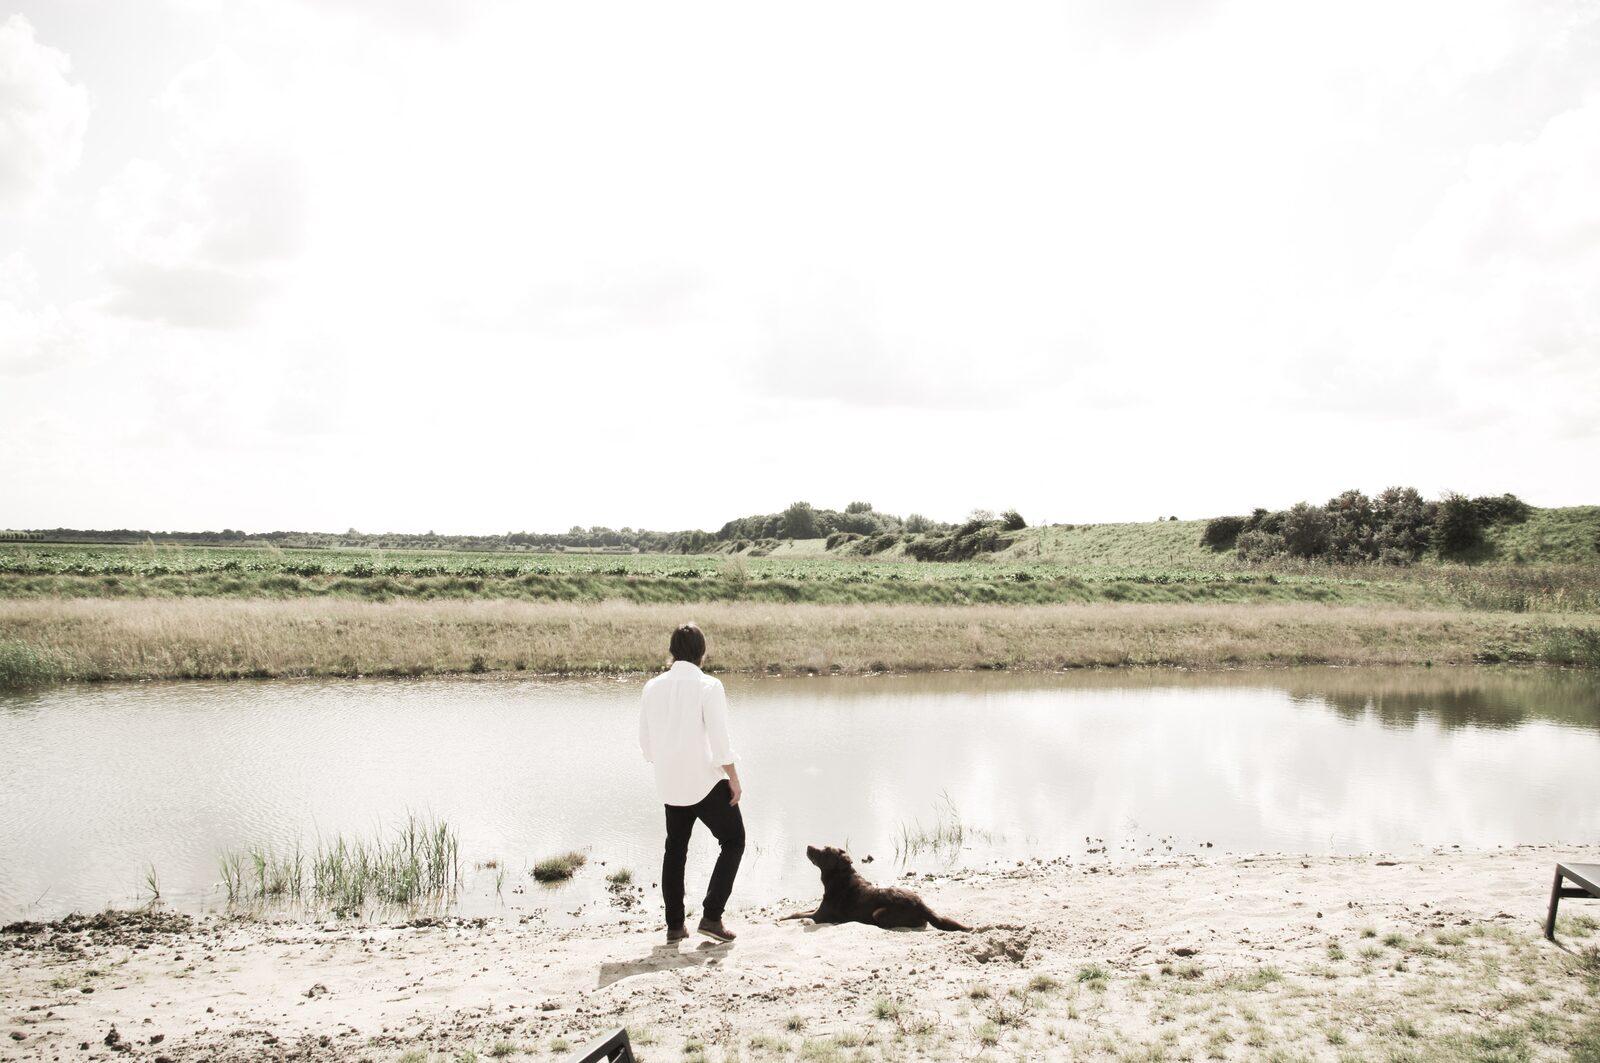 Luxus-Ferienhaus Zeeland Hunden wilkommen